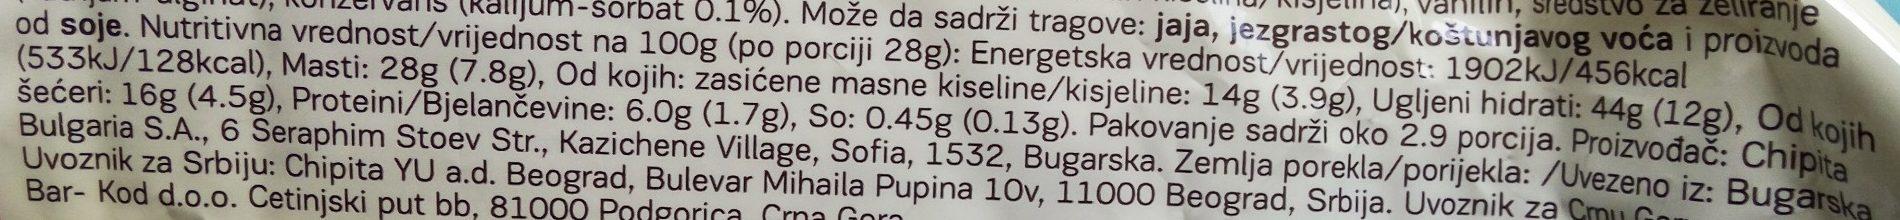 7 Days Max Croissant Cocoa Filling - Hranljiva vrednost